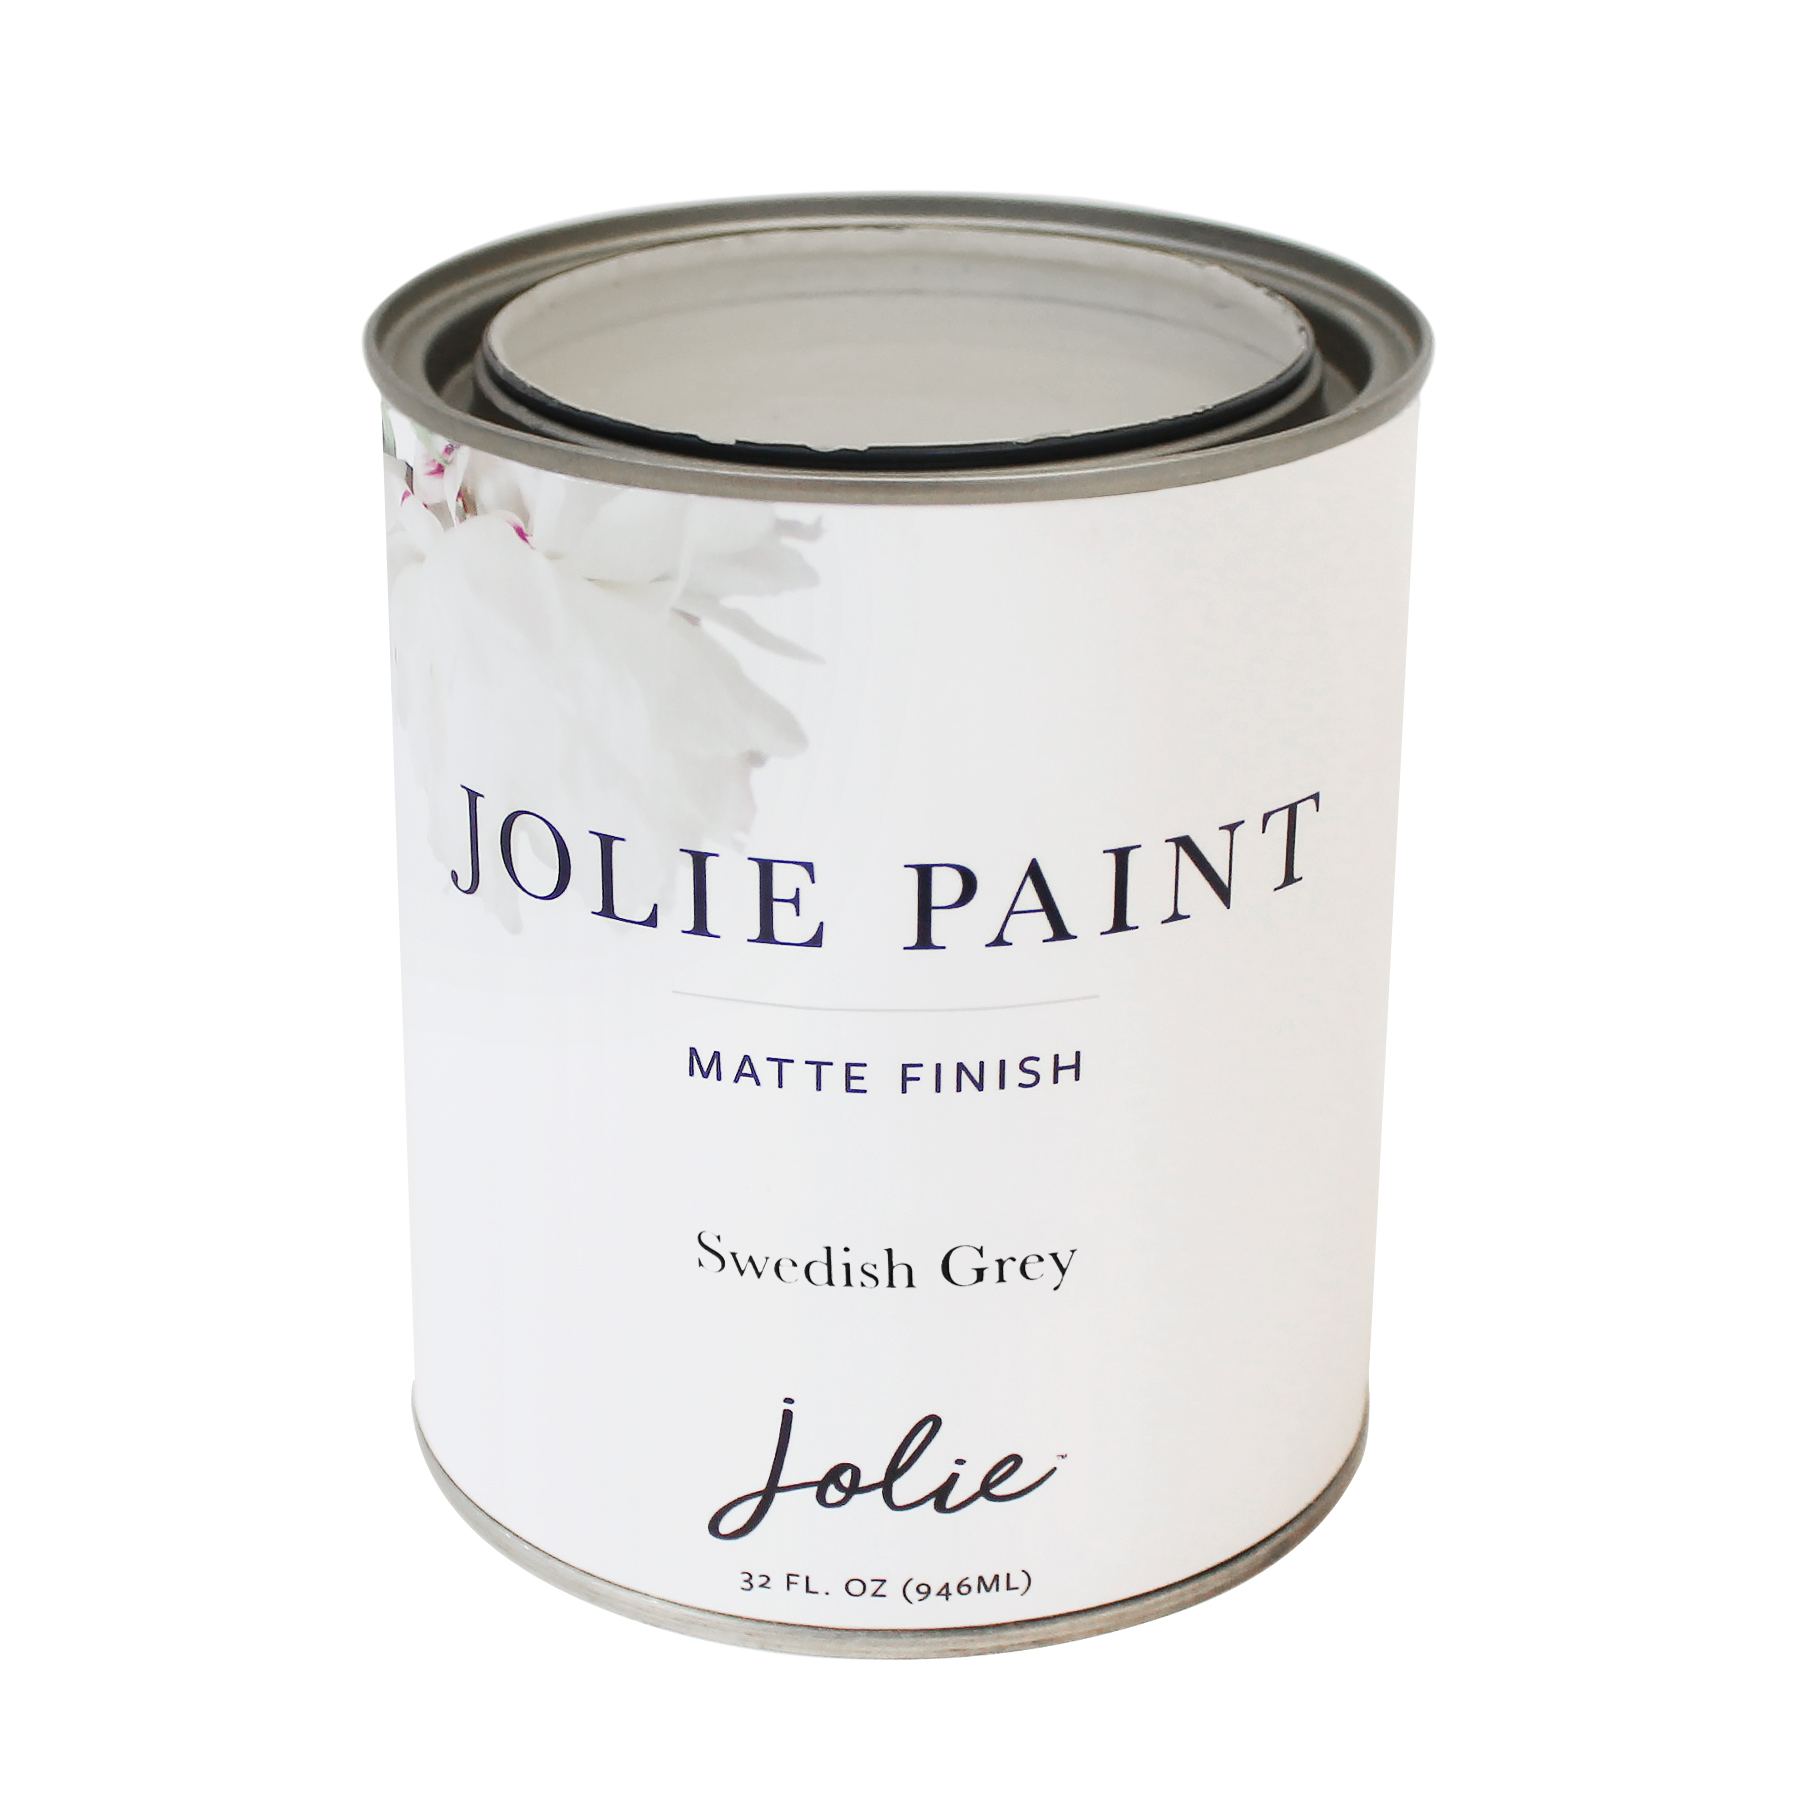 Swedish Grey - Jolie Paint